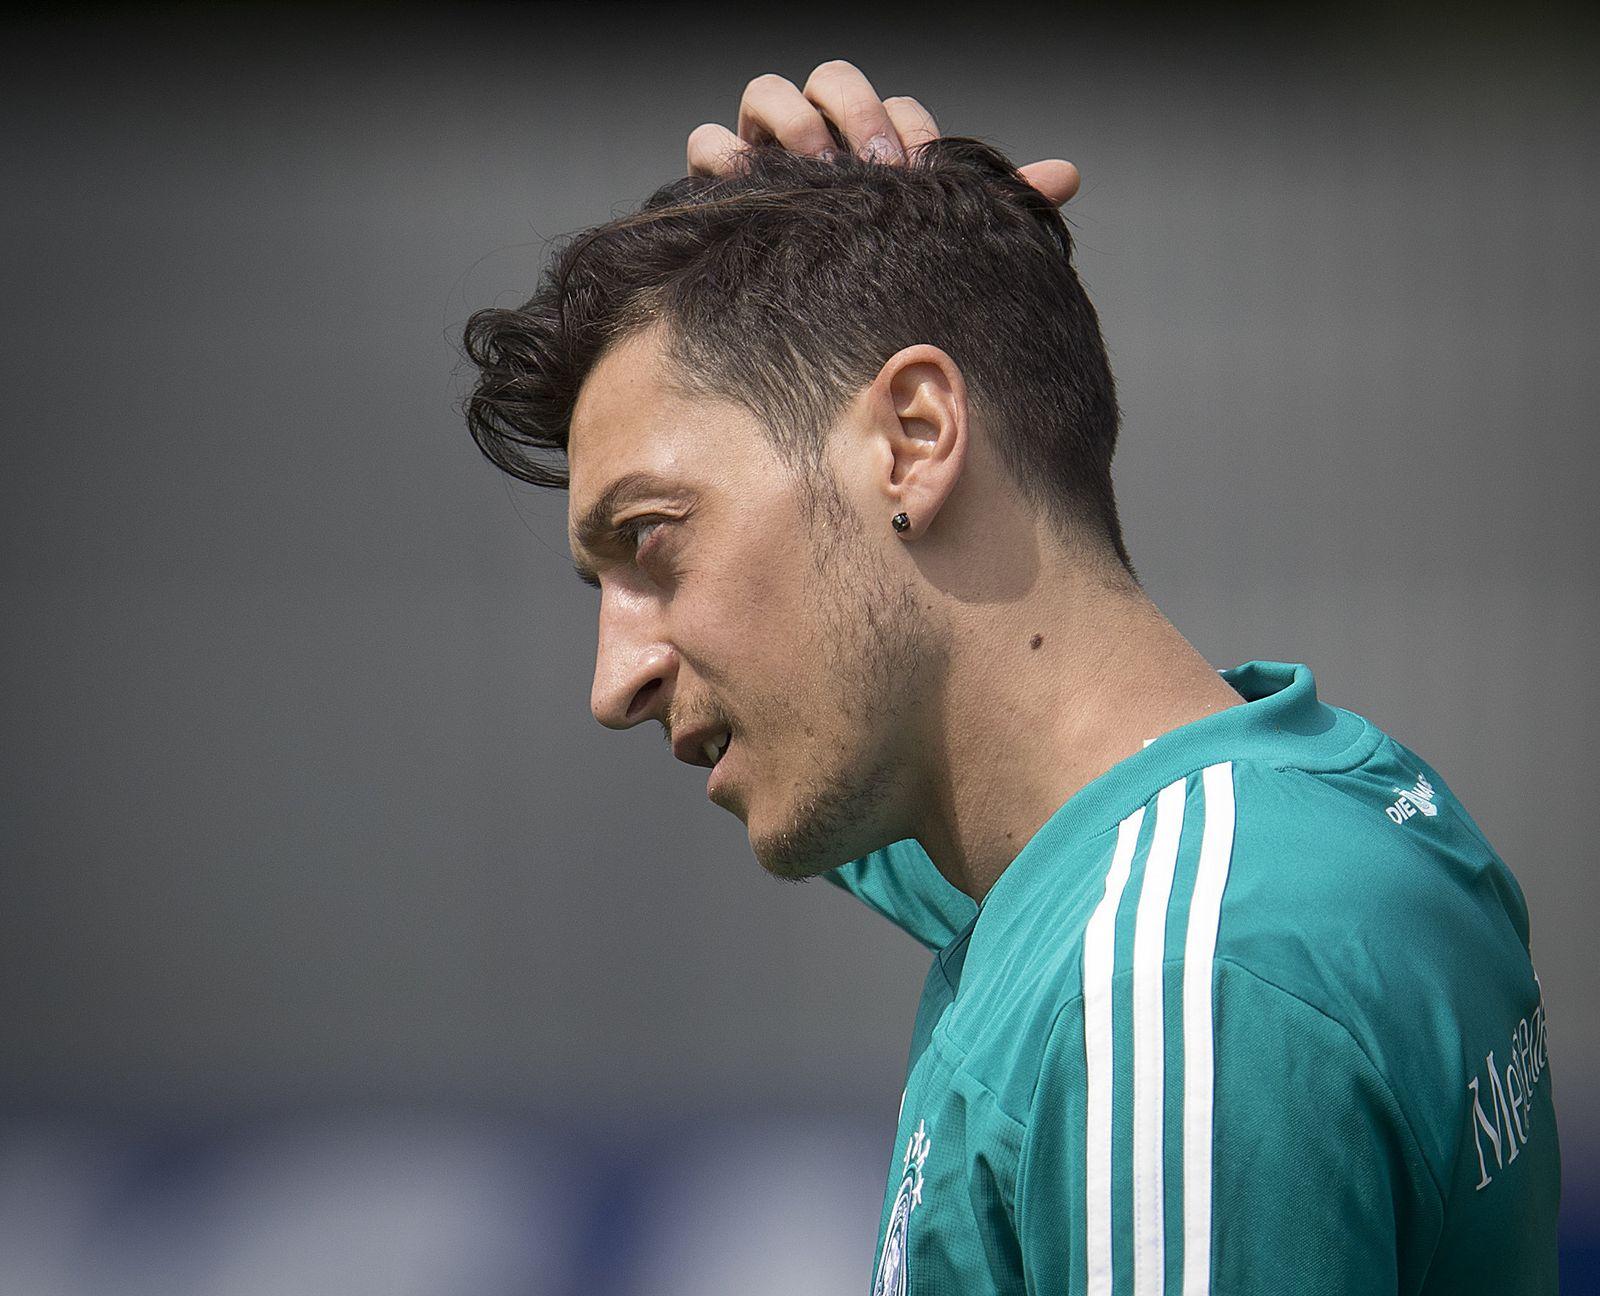 WM 2018 - Mesut Özil